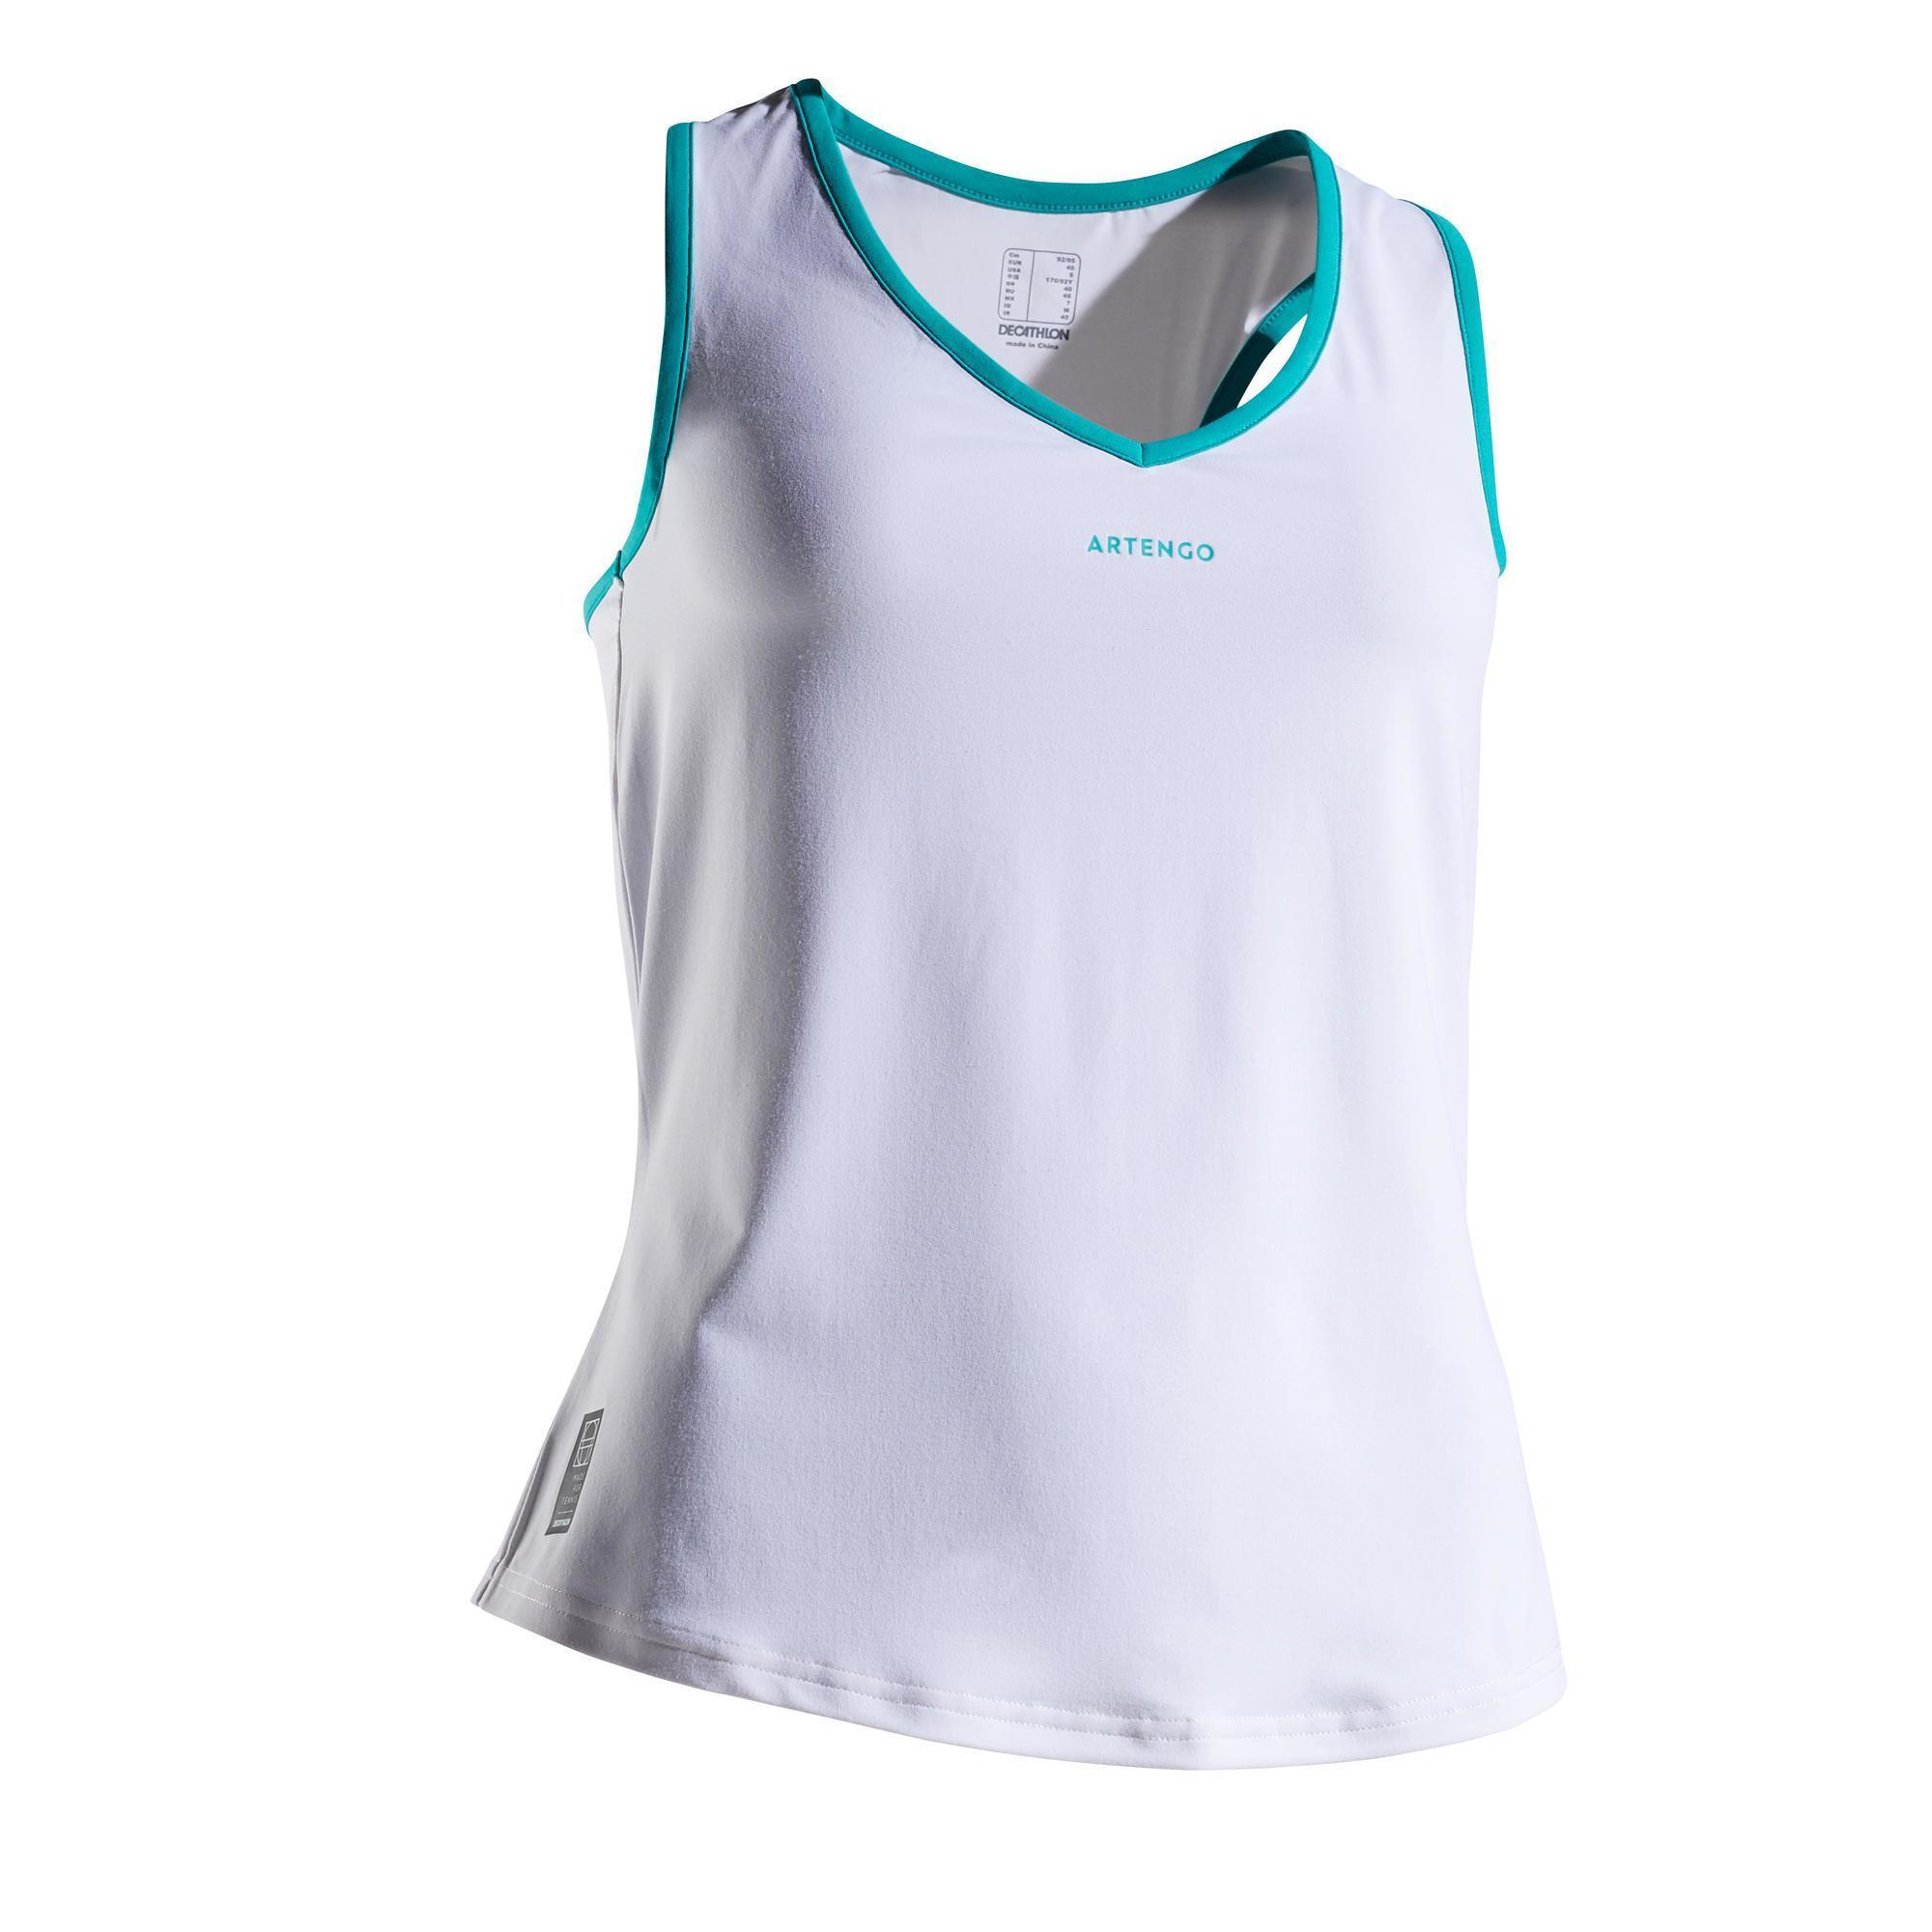 Tennis-Top TK Light 900 Damen weiß | Sportbekleidung > Sporttops > Tennistops | Artengo